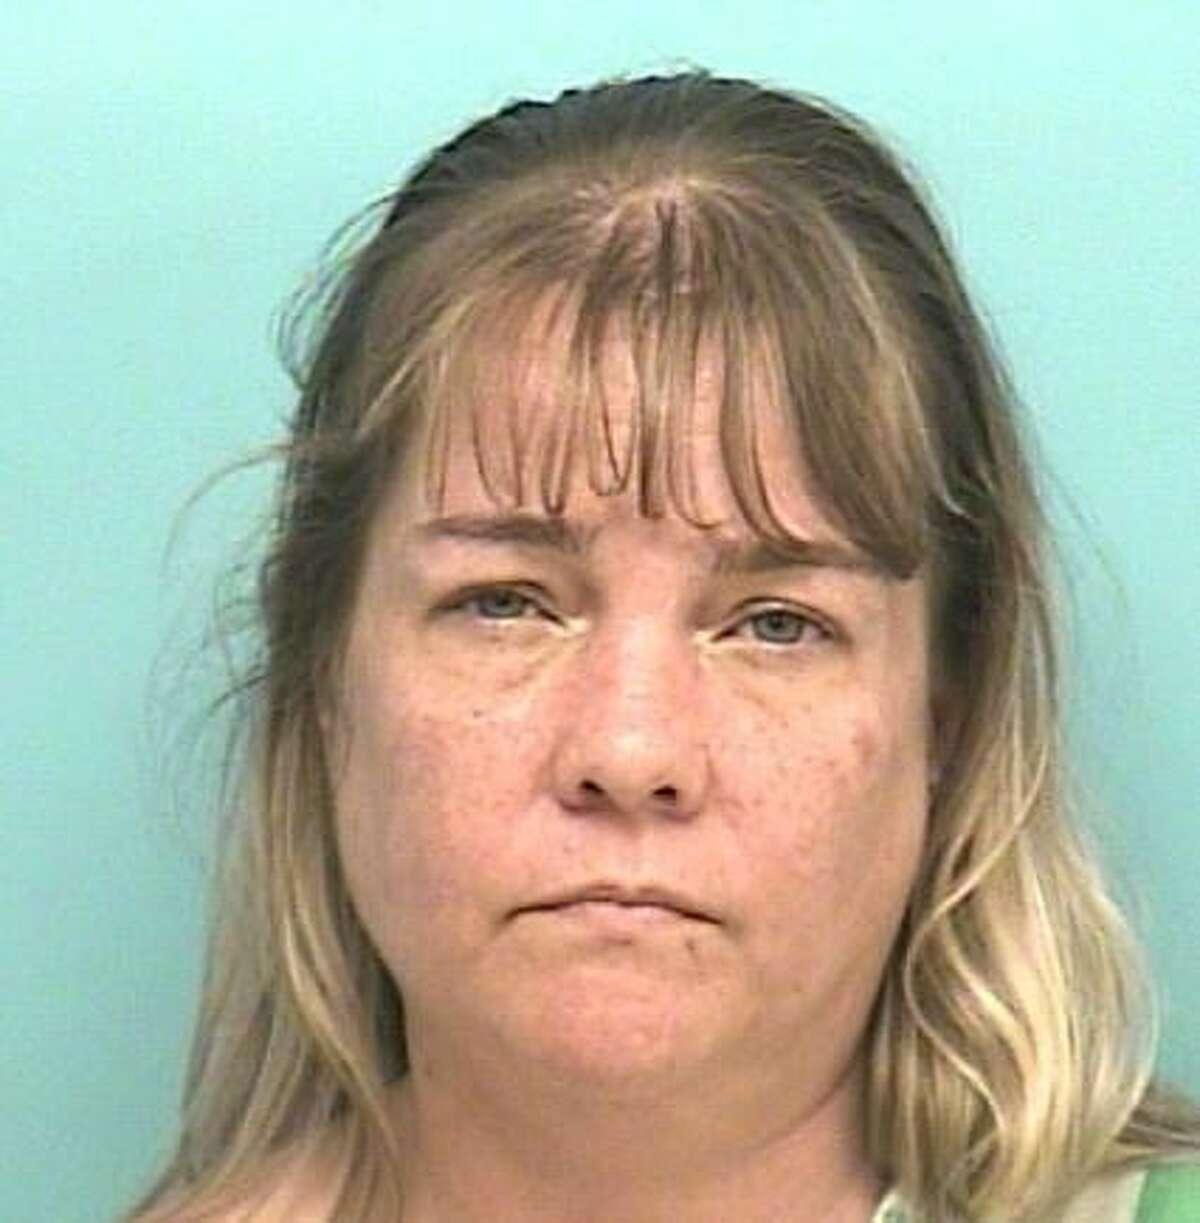 BENNETT, Tammy MichelleWhite/Female DOB: 11/25/1968Height: 5'03 ' Weight: 150 lbs.Hair: Brown Eyes: BlueWarrant: # 081009595 Motion to RevokeDWI 3rd or MoreLKA: Sullivan Rd., New Caney.